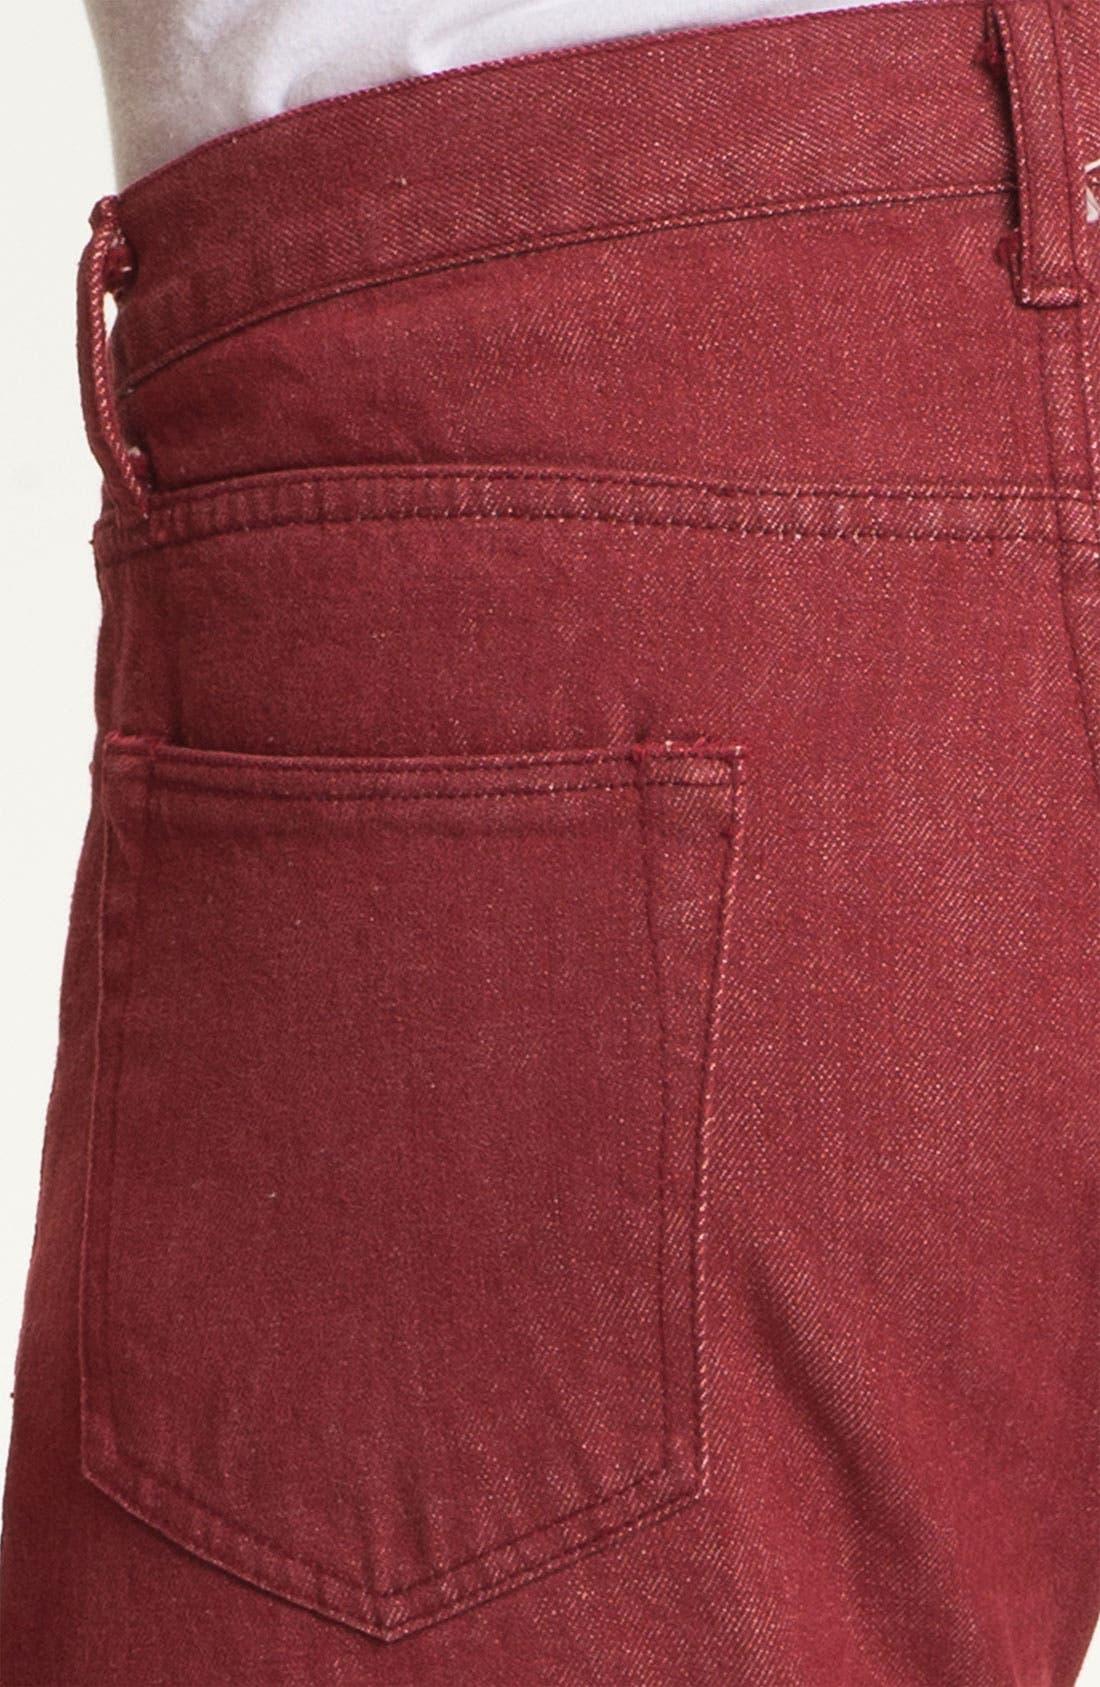 Alternate Image 4  - J. Press York Street 'Hanover' Slim Fit Selvedge Jeans